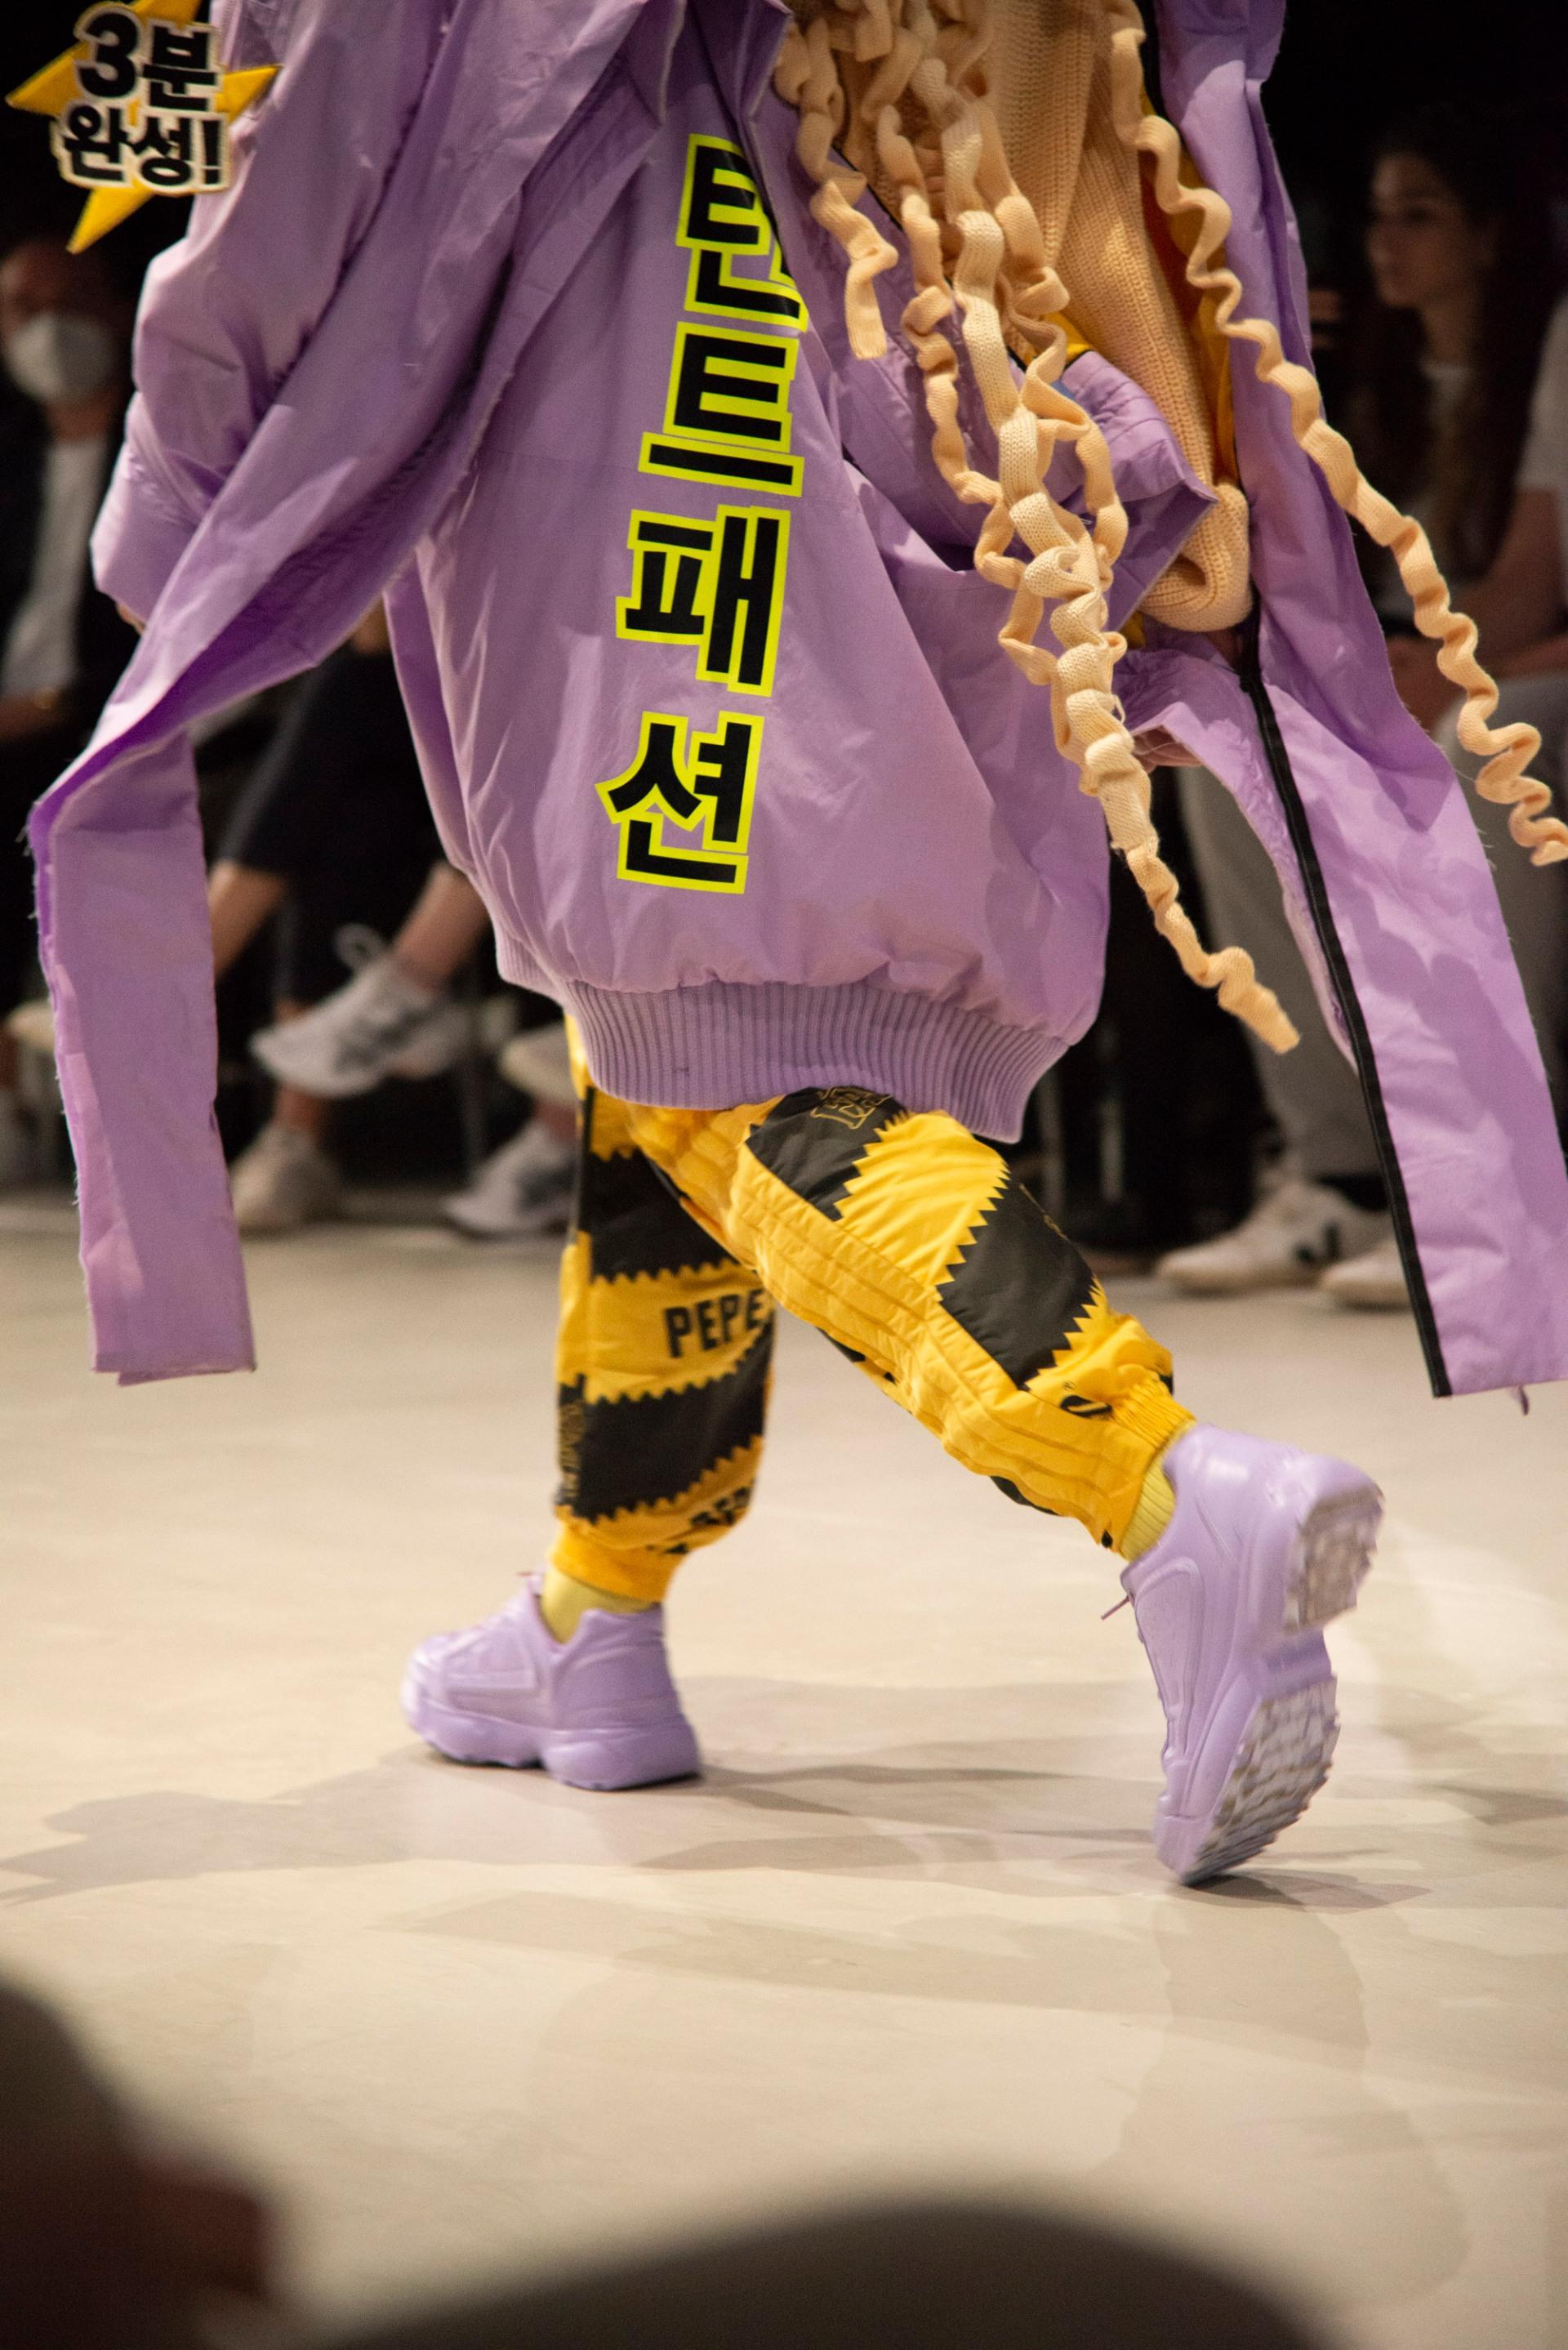 Pepe Jo Kaul, designer | Neo.Fashion.21, 6.9.2021, Graduate Show 2, HAW Hamburg, Alte Münze, Berlin